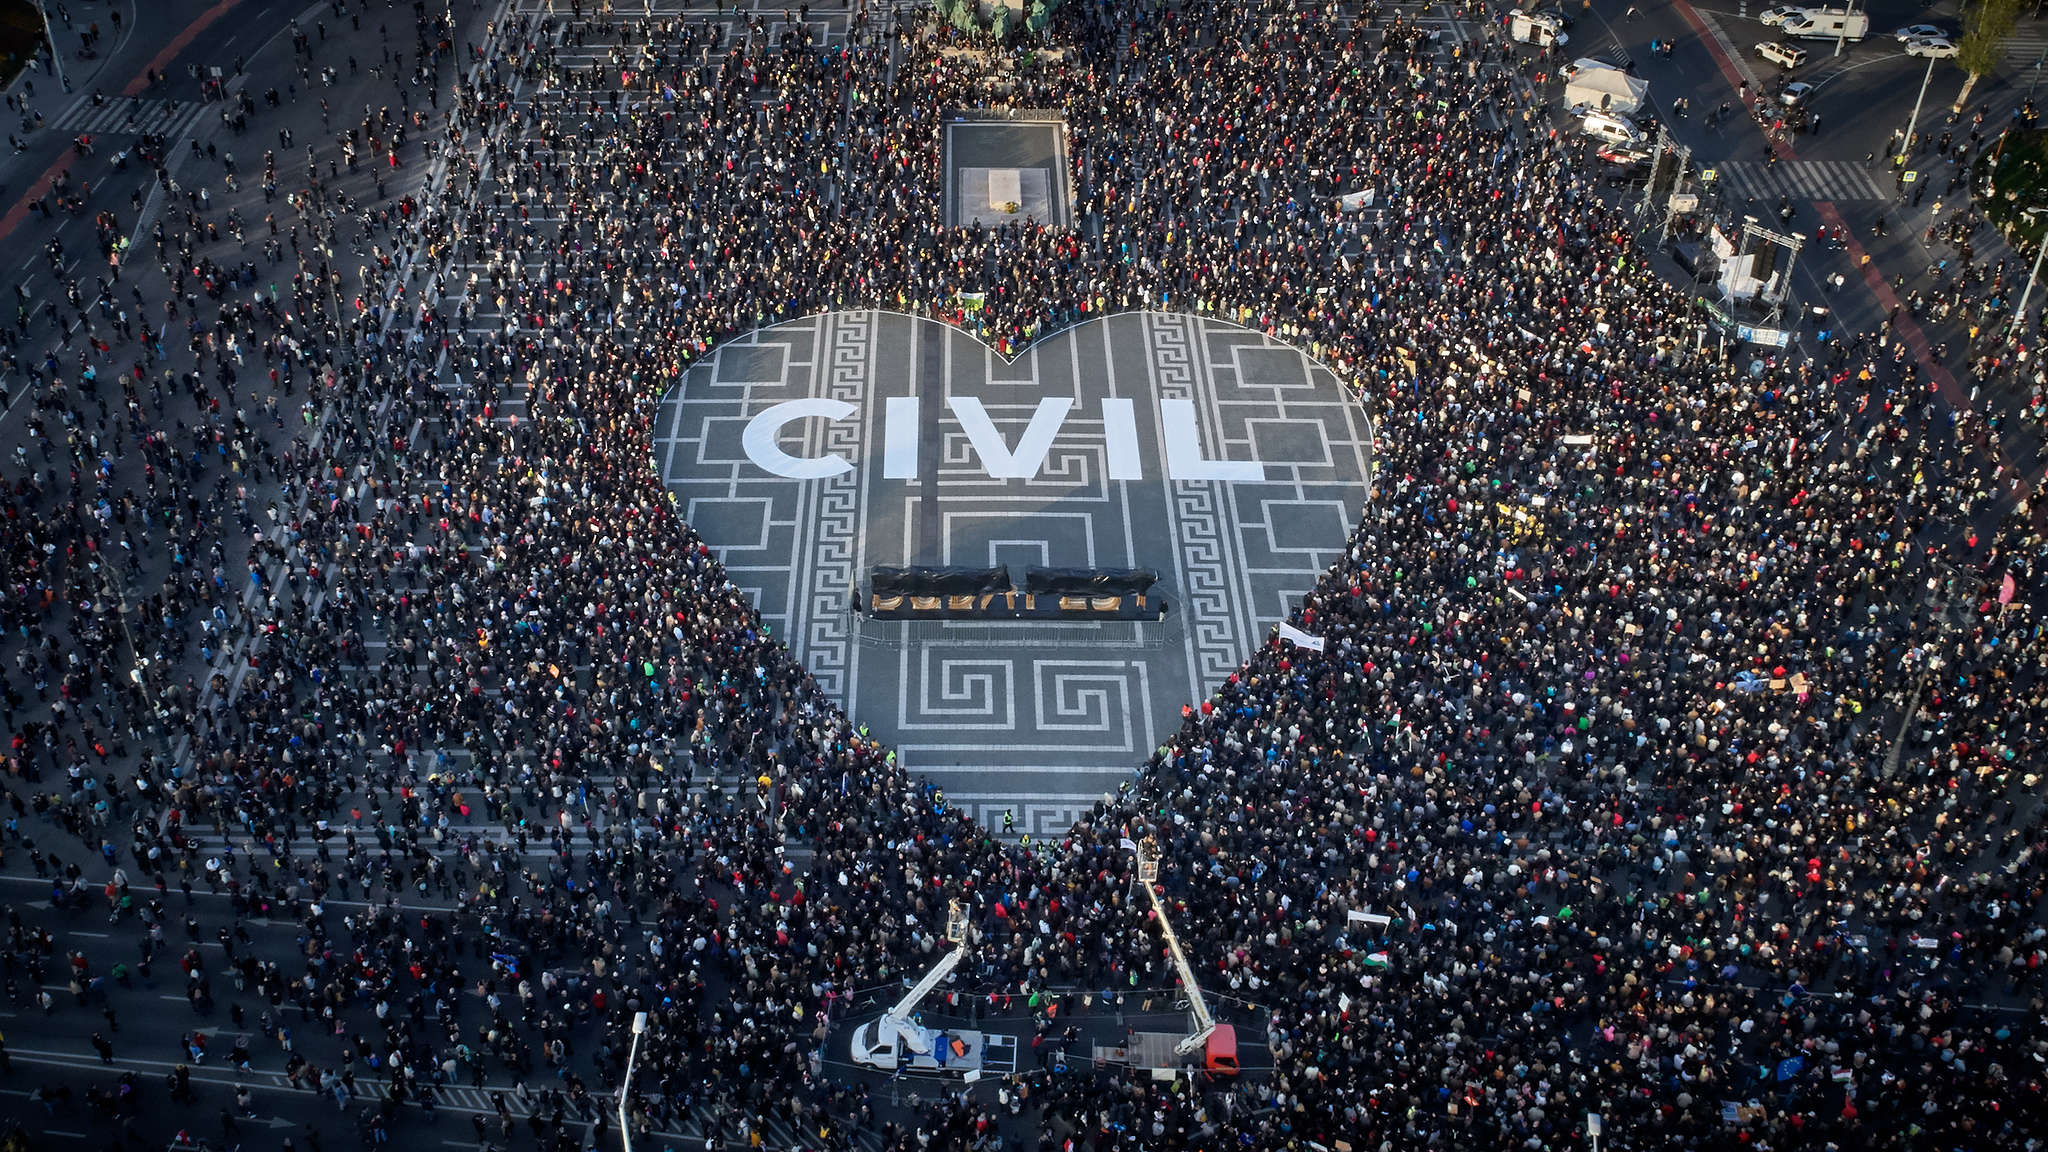 Heroes' Veto, pro-NGO Protest in Budapest © Attila Pethe